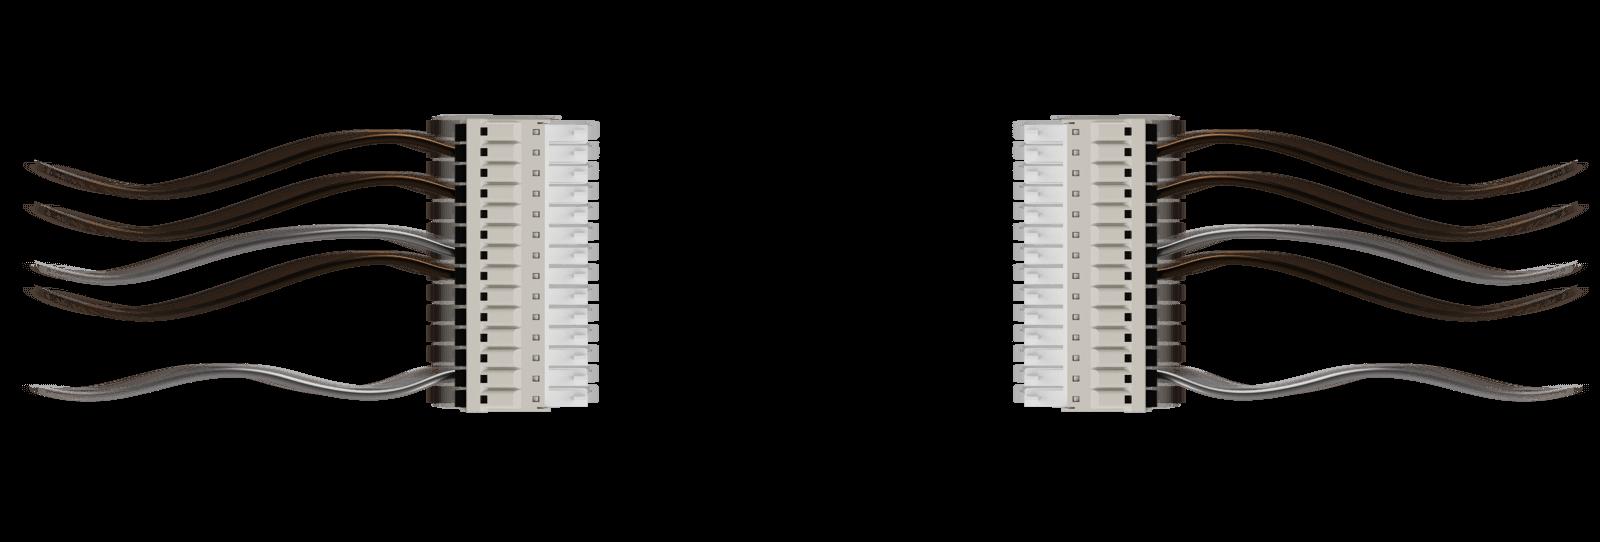 IO-Module 的 IO-plug